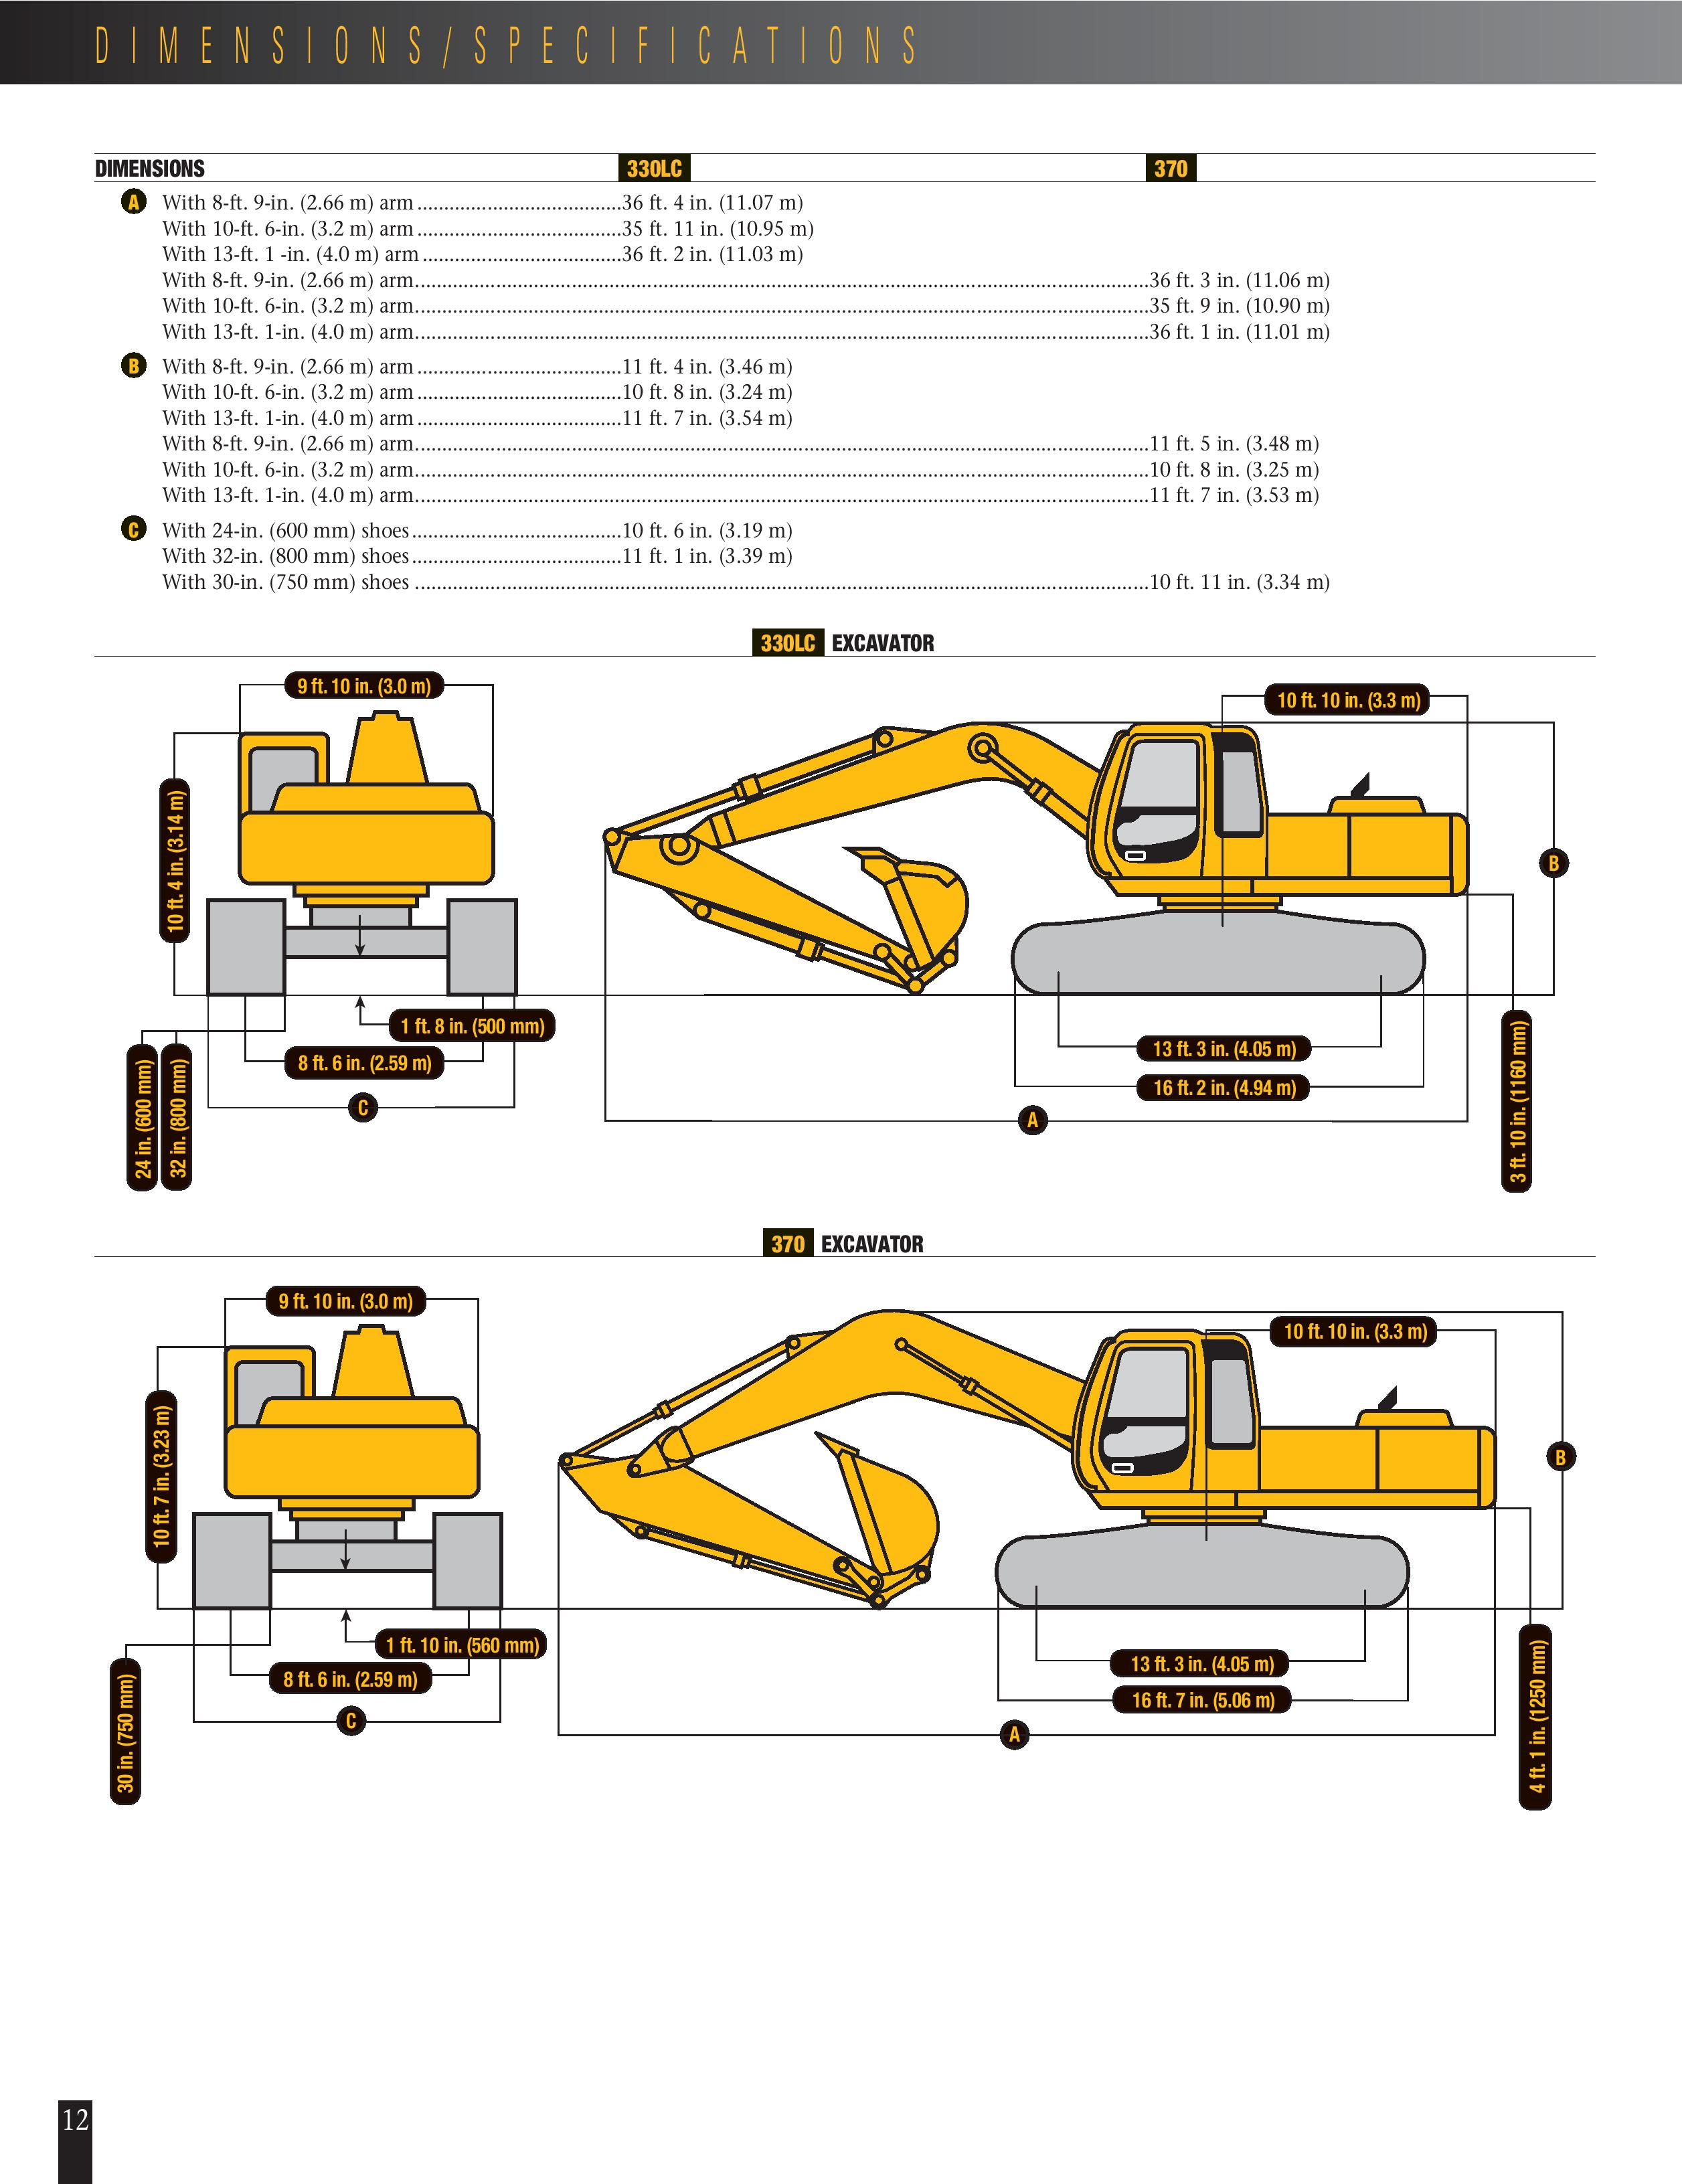 John Deere Hydraulic Excavator Supplier Worldwide Used